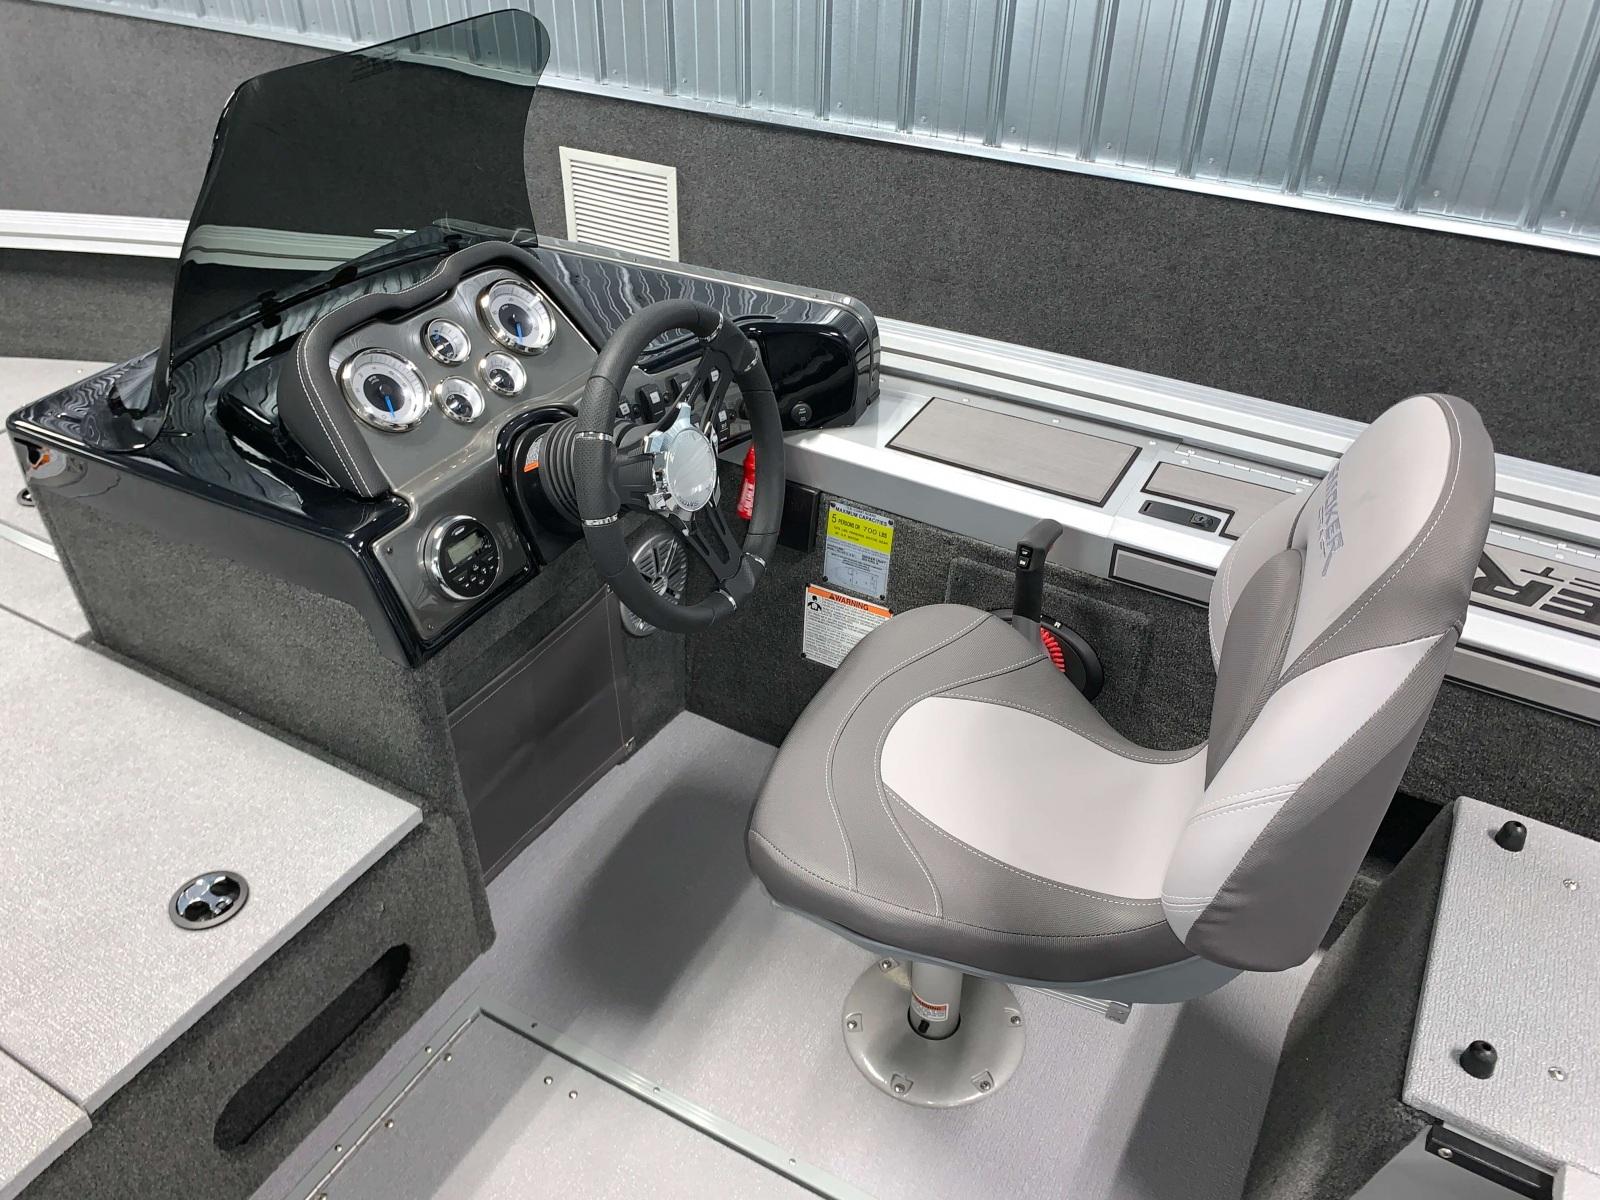 2020-Smoker-Craft-161-Pro-Angler-XL-Fishing-Boat-Drivers-Helm